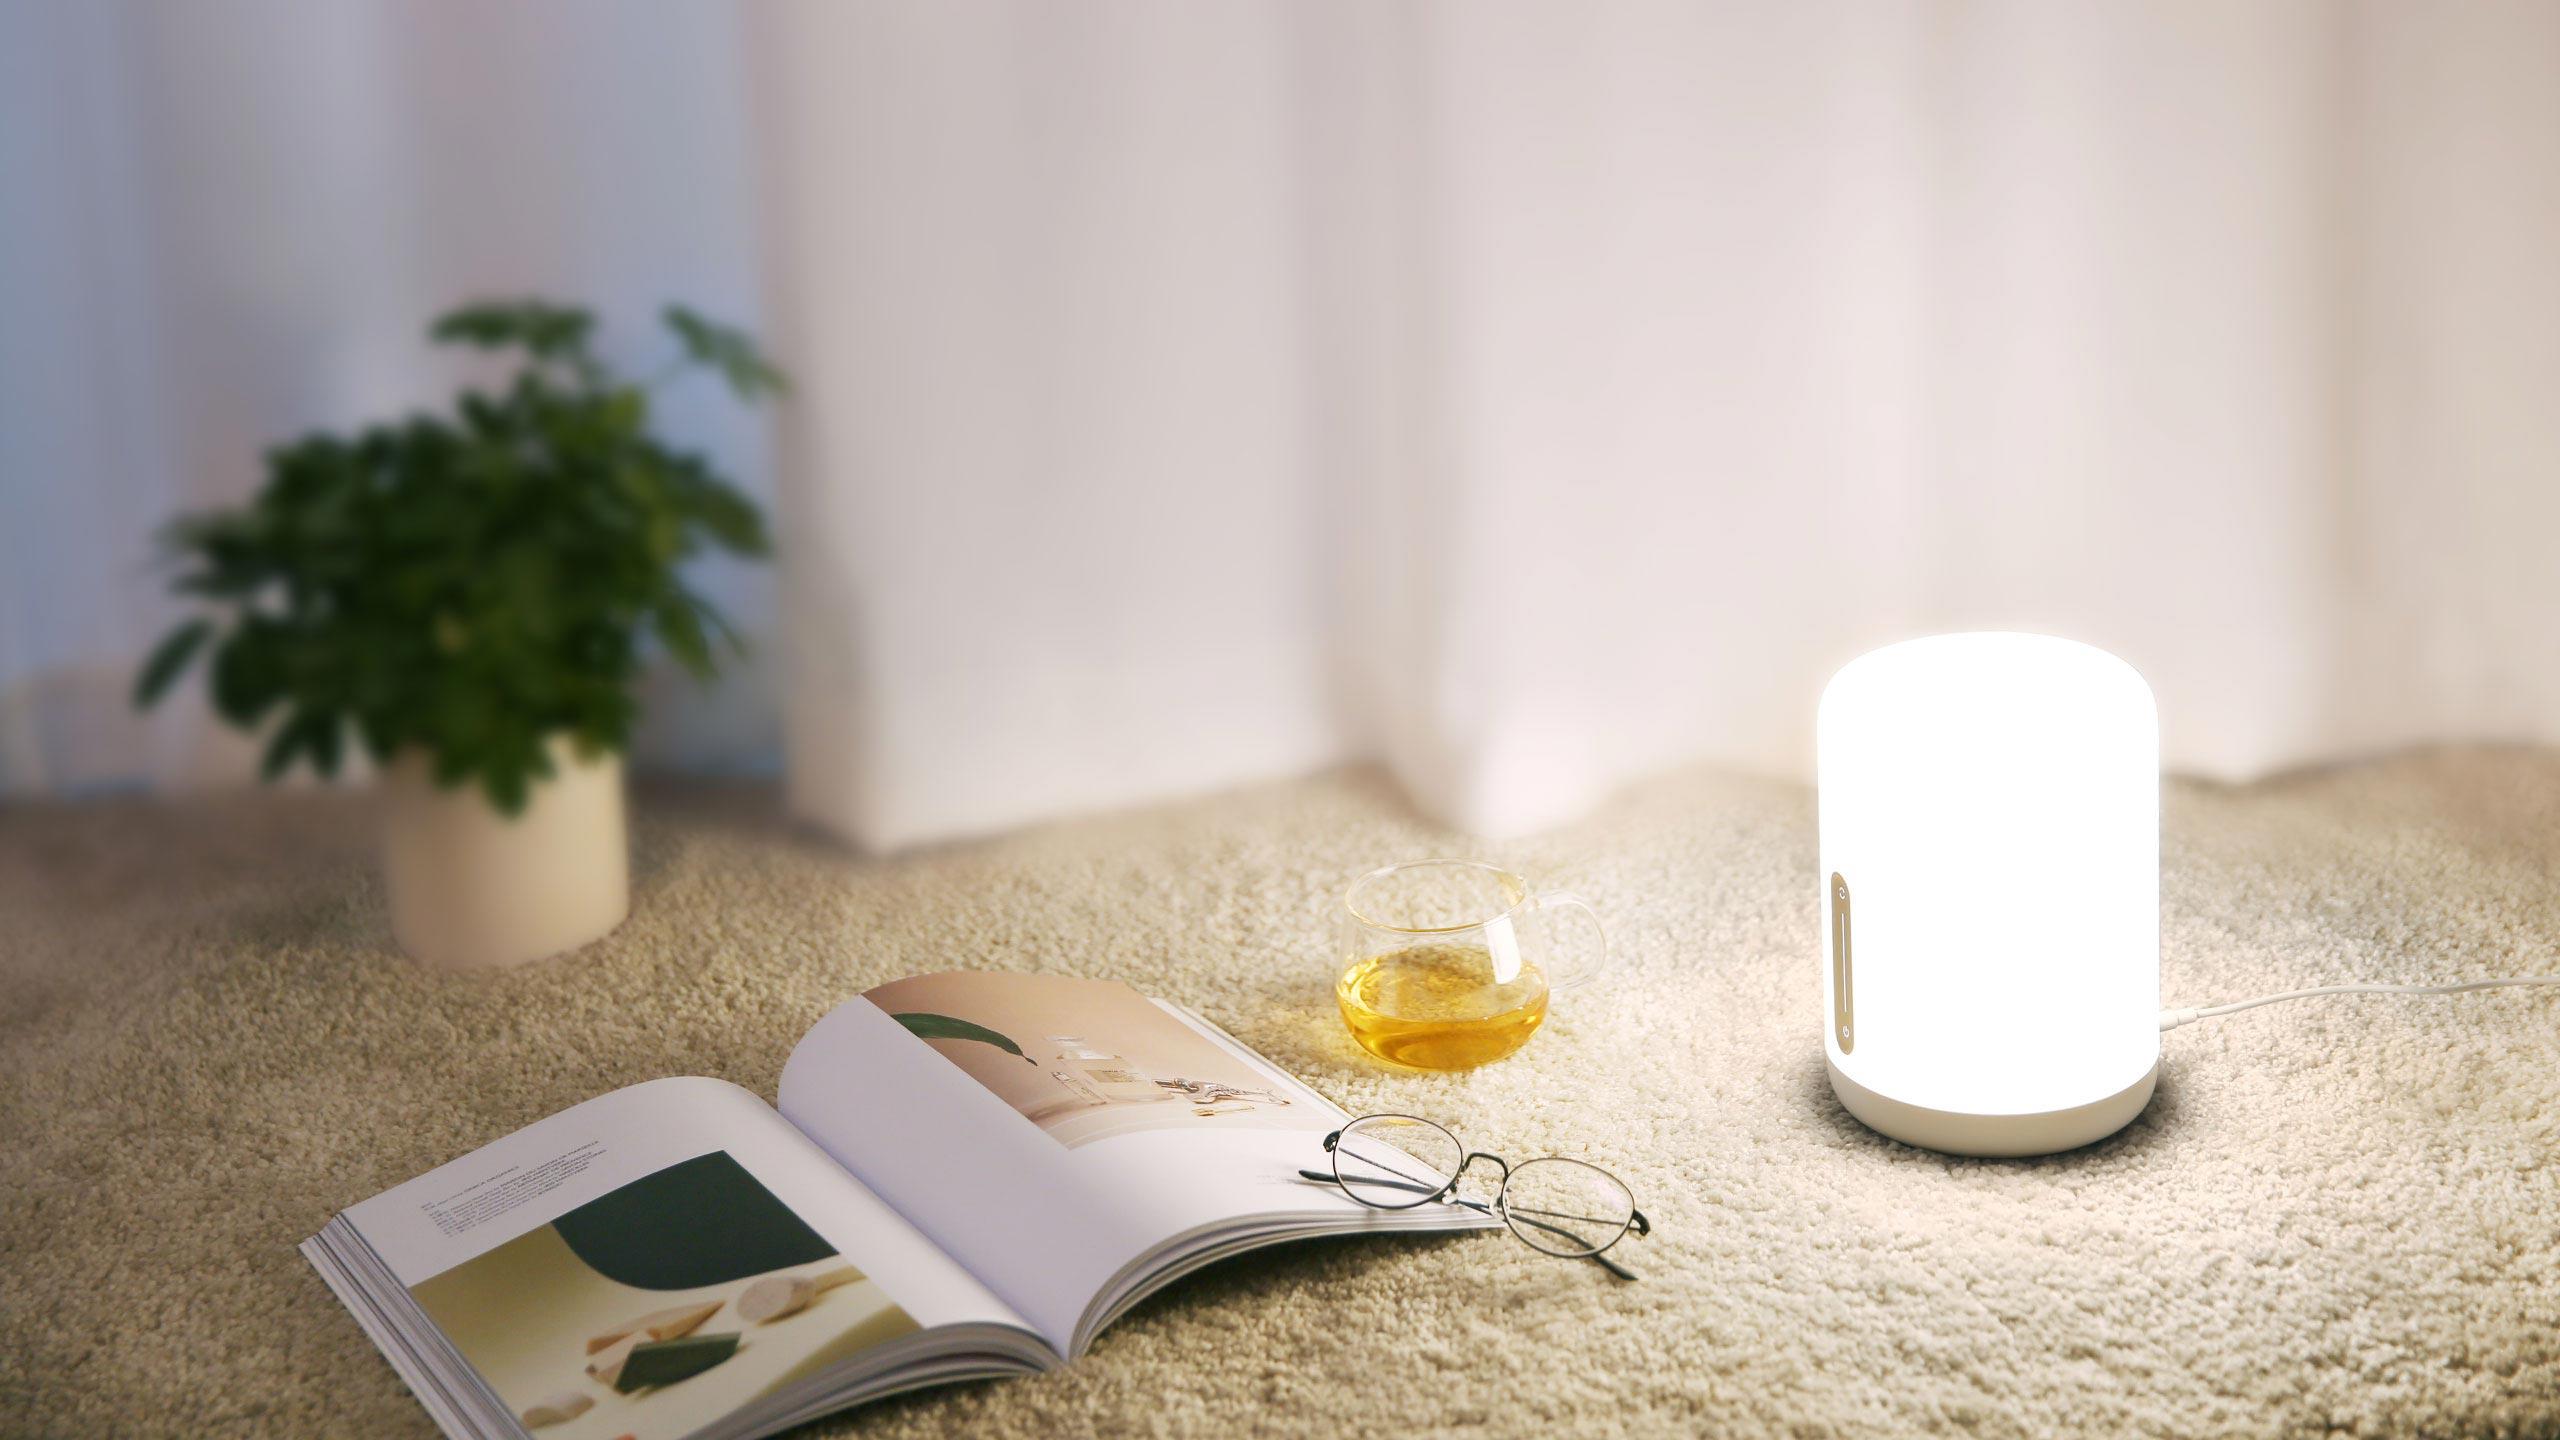 xiaomi-mijia-lamp-2